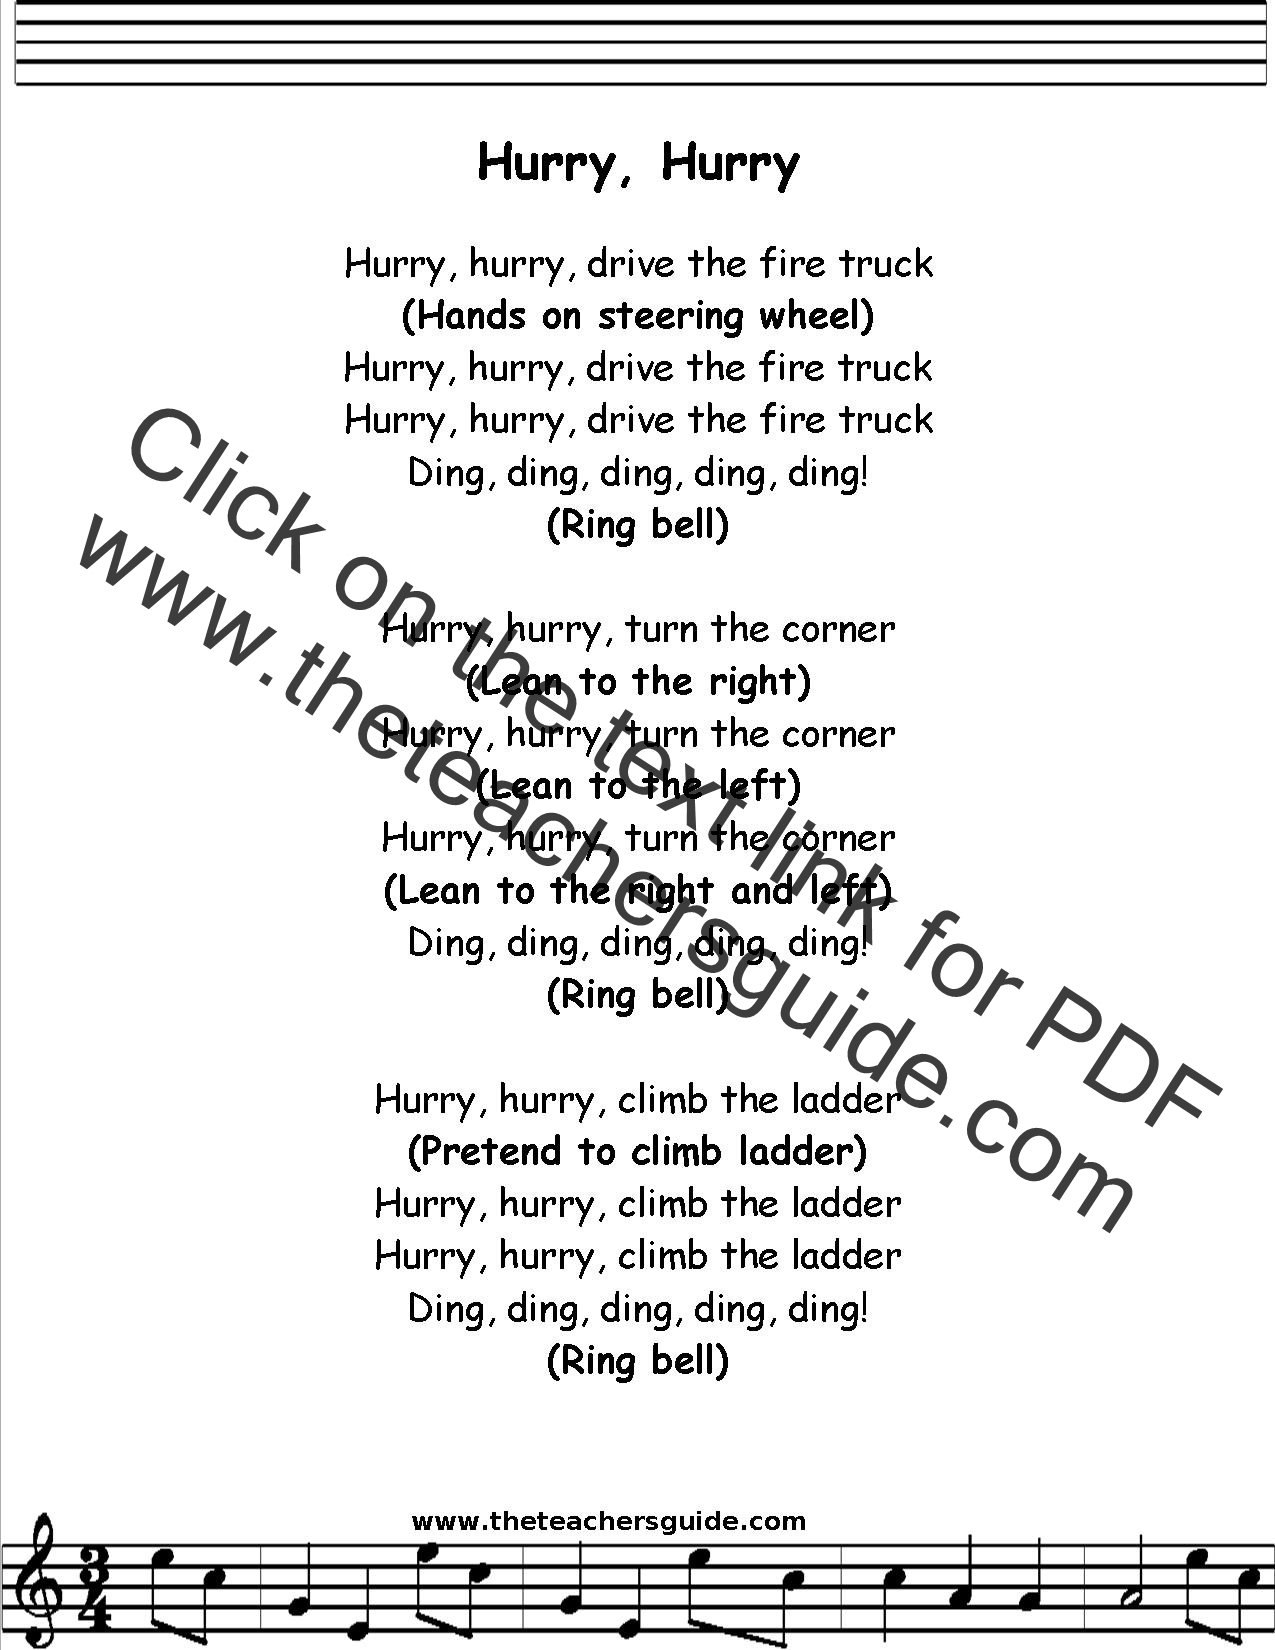 Hurry Hurry Drive the Truck Lyrics, Printout, MIDI, and Video